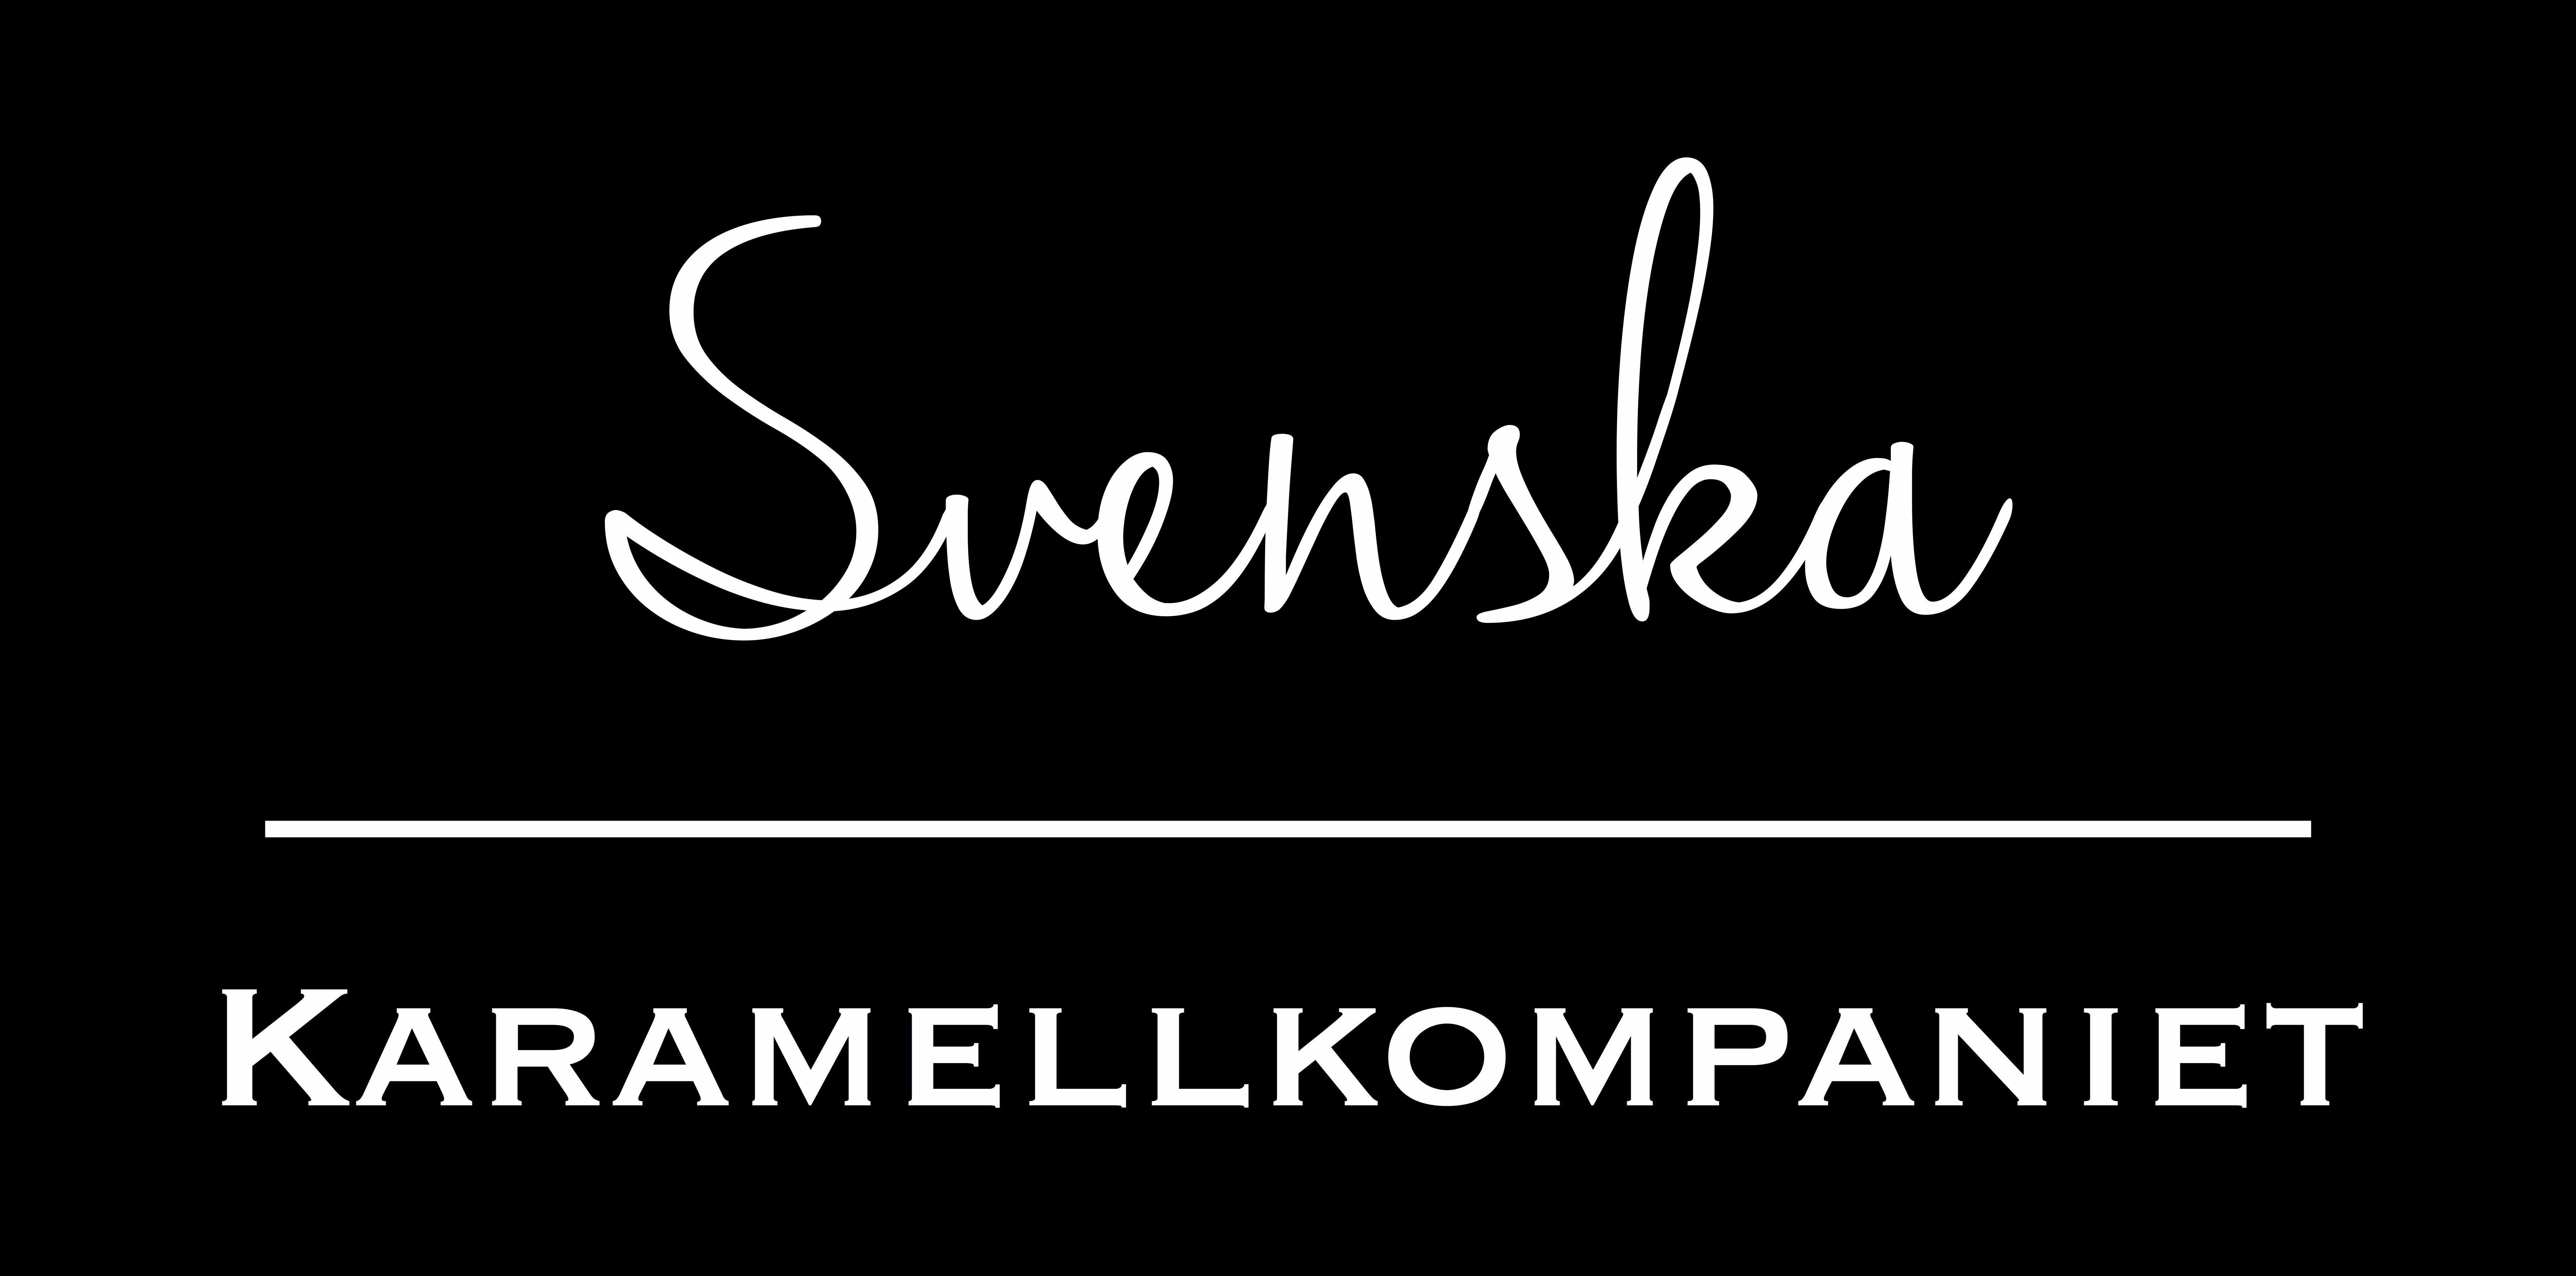 Svenska Karamellkompaniet